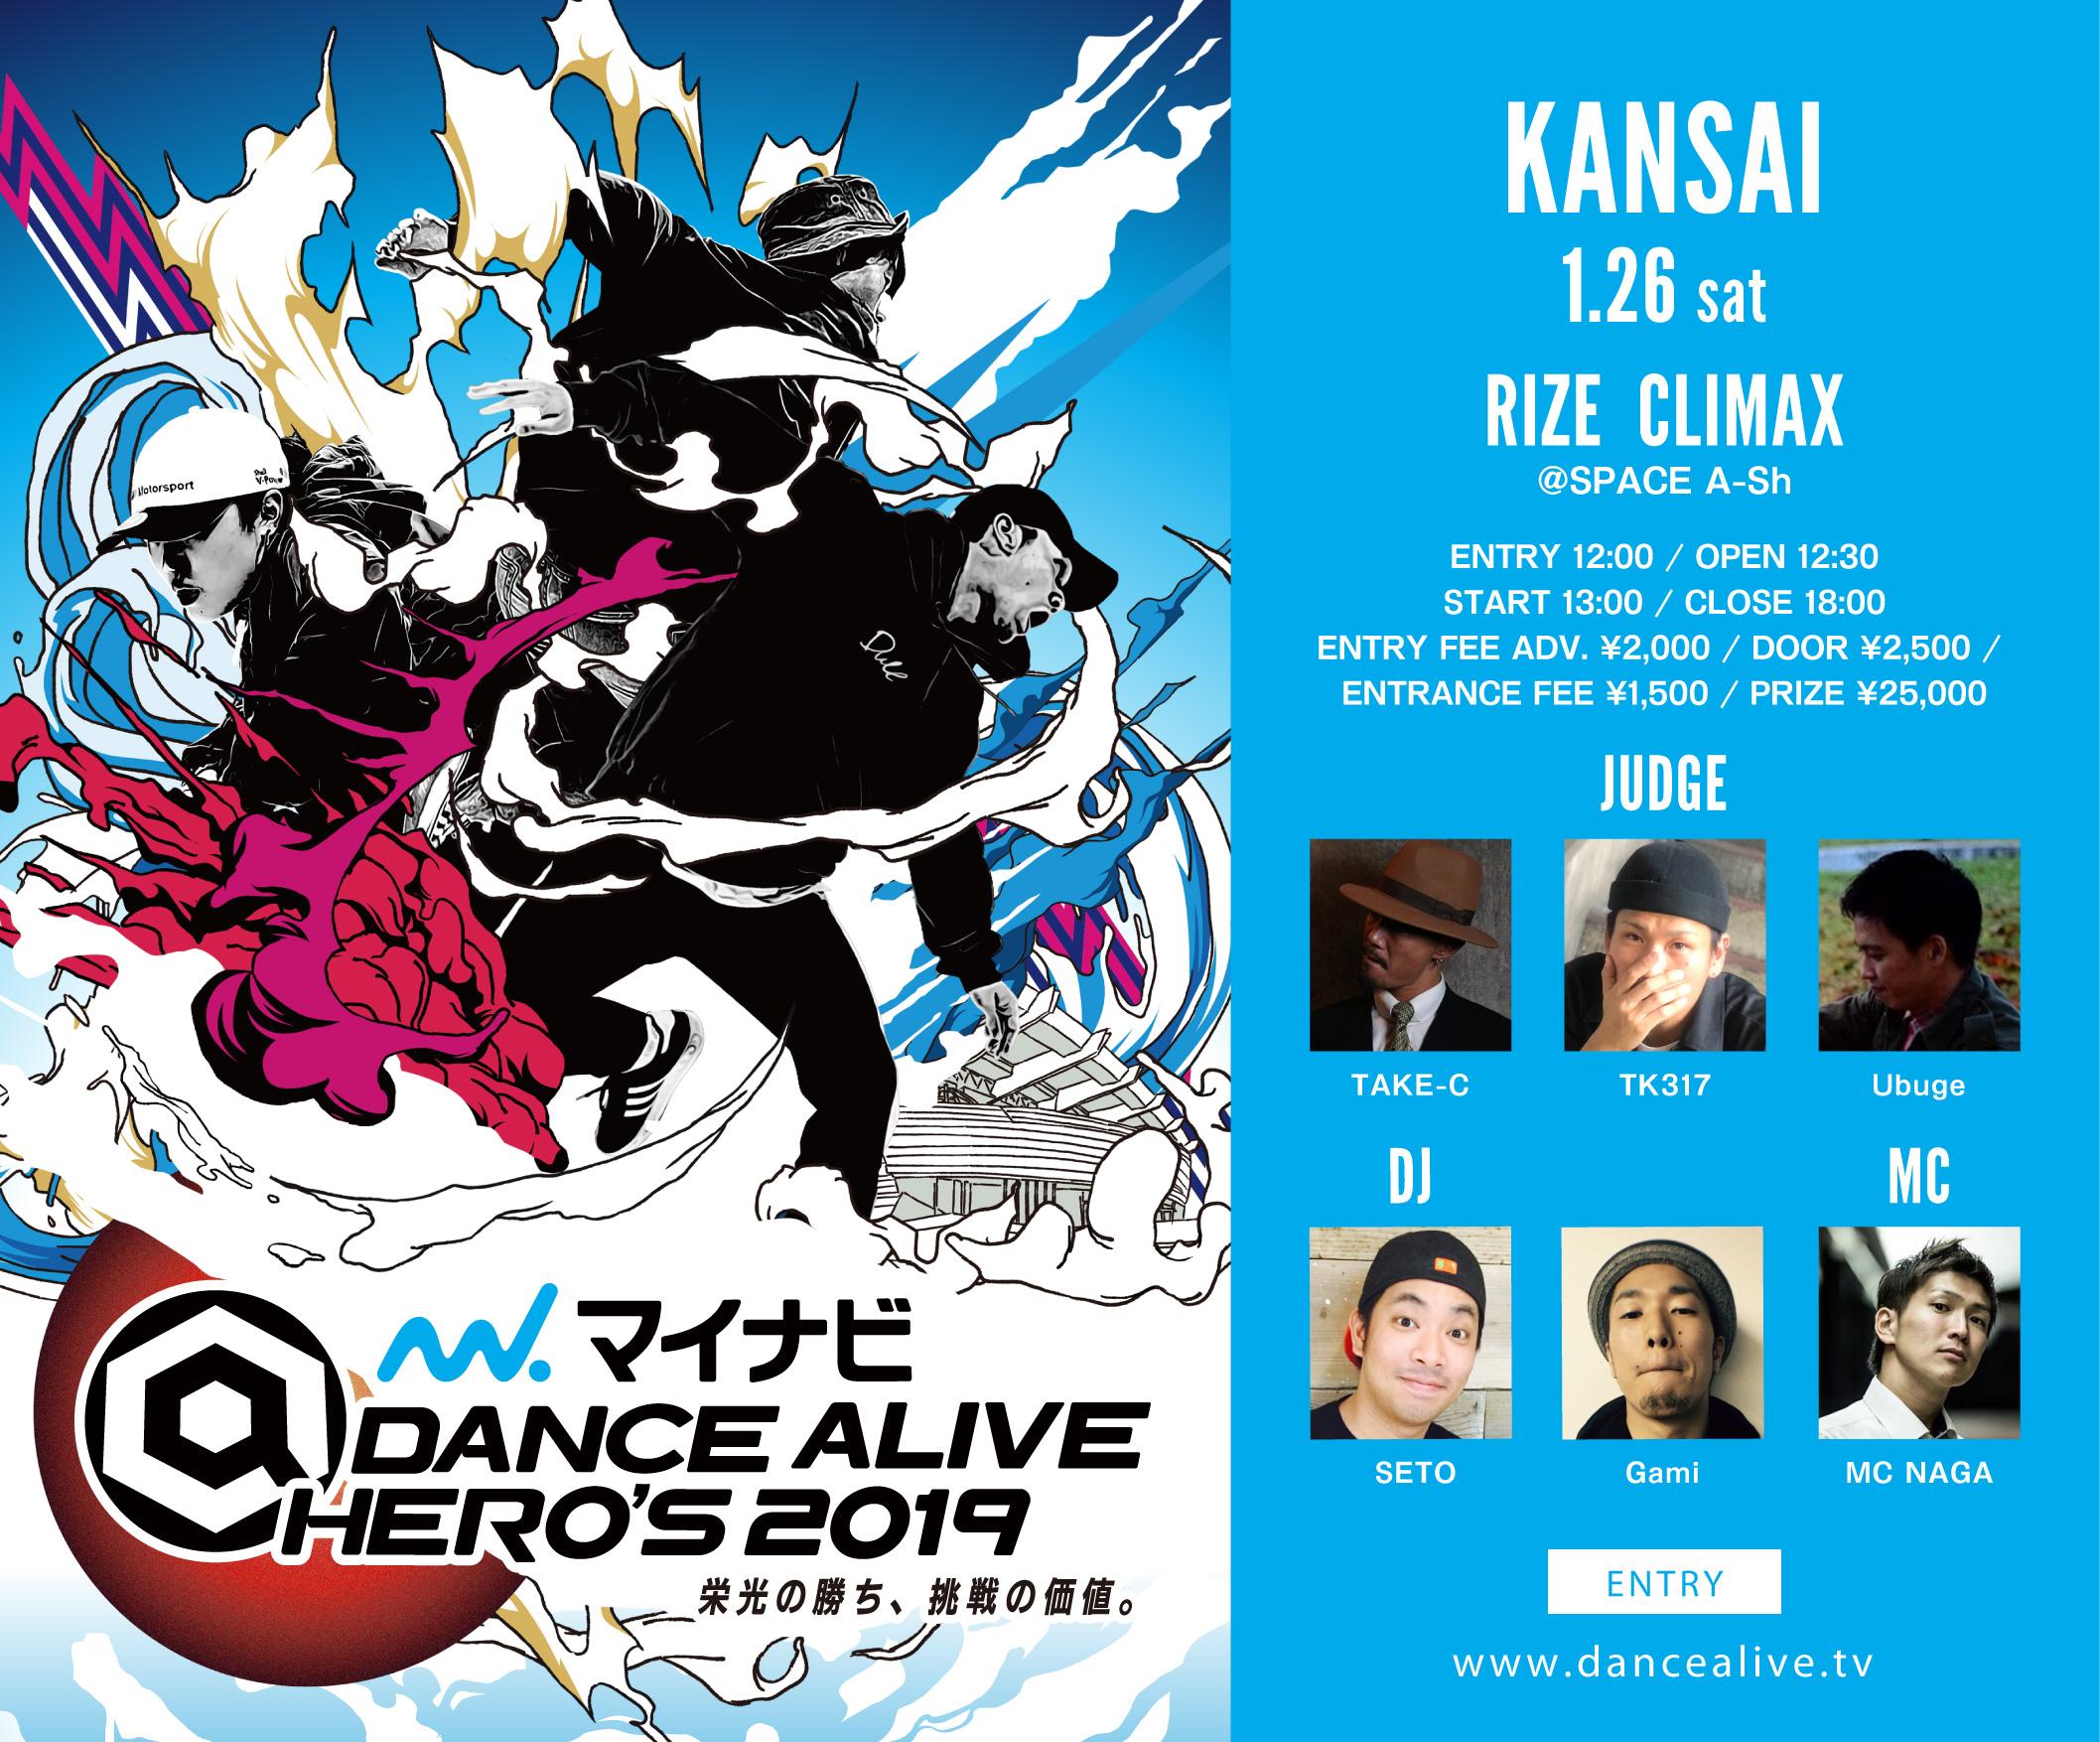 DANCE ALIVE HERO'S 2019 RIZE KANSAI CLIMAX